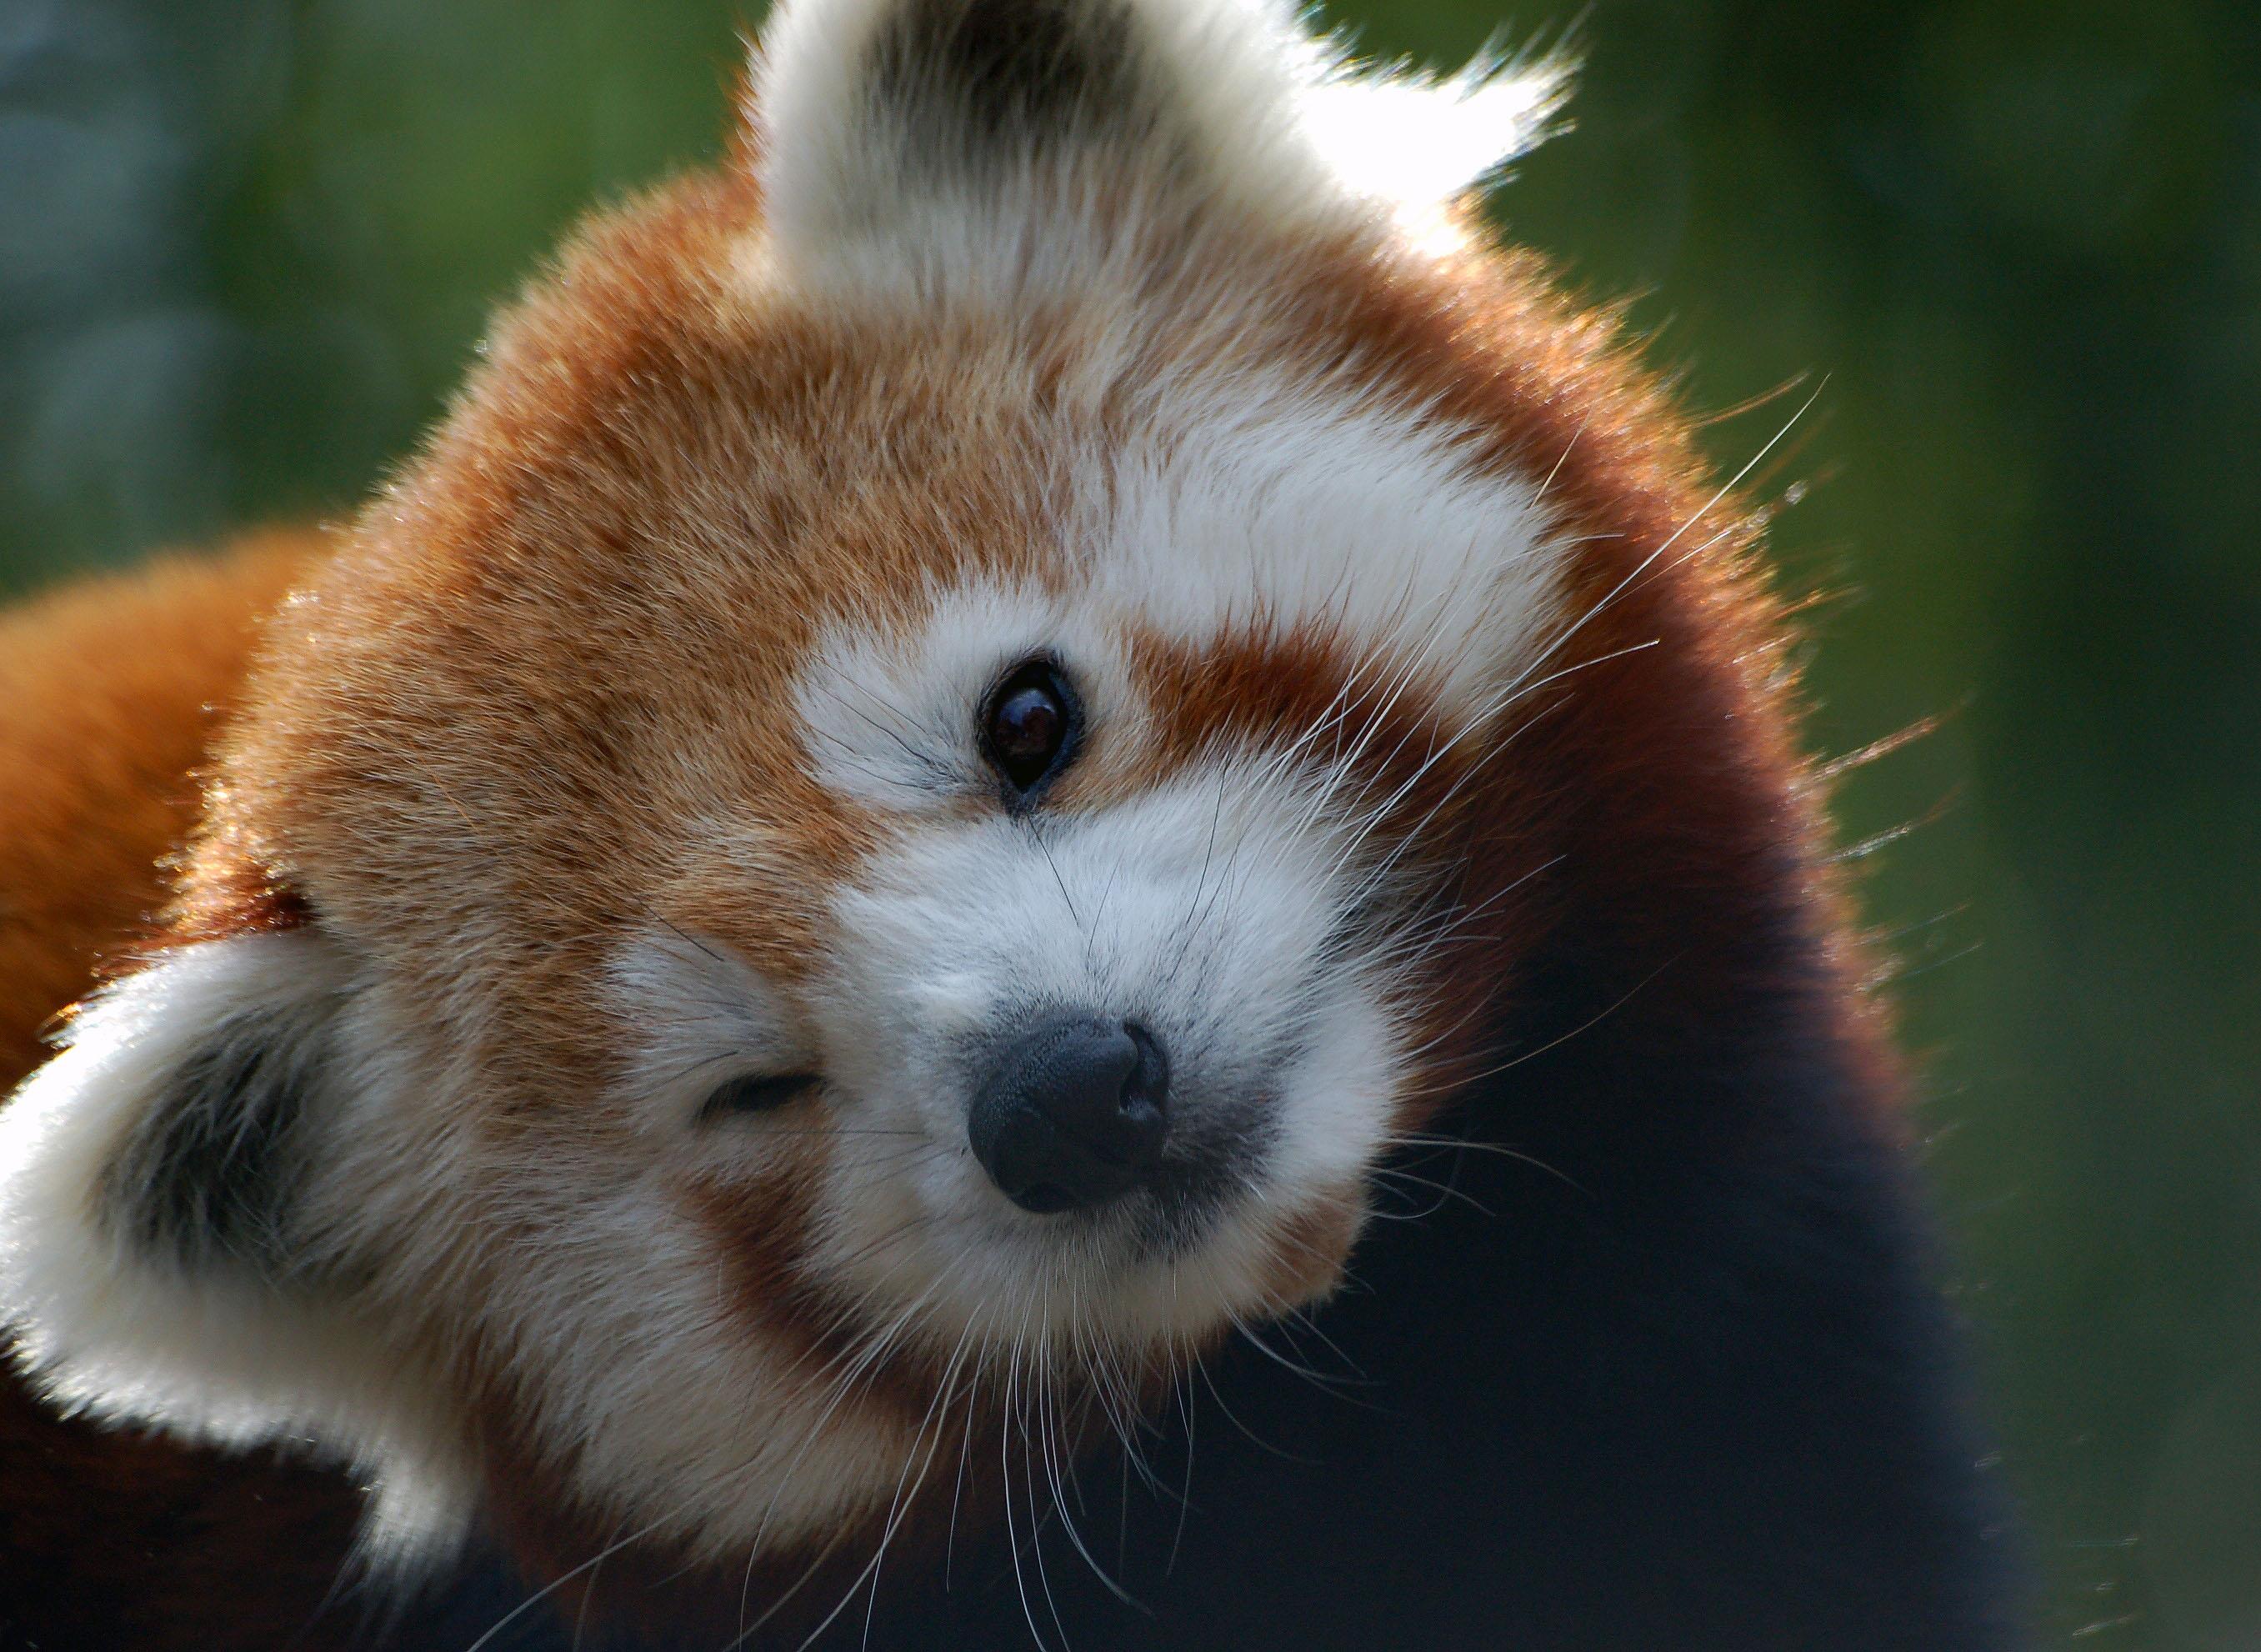 Panda Roux Full HD Fond d'écran and Arrière-Plan | 2713x1982 | ID:650156